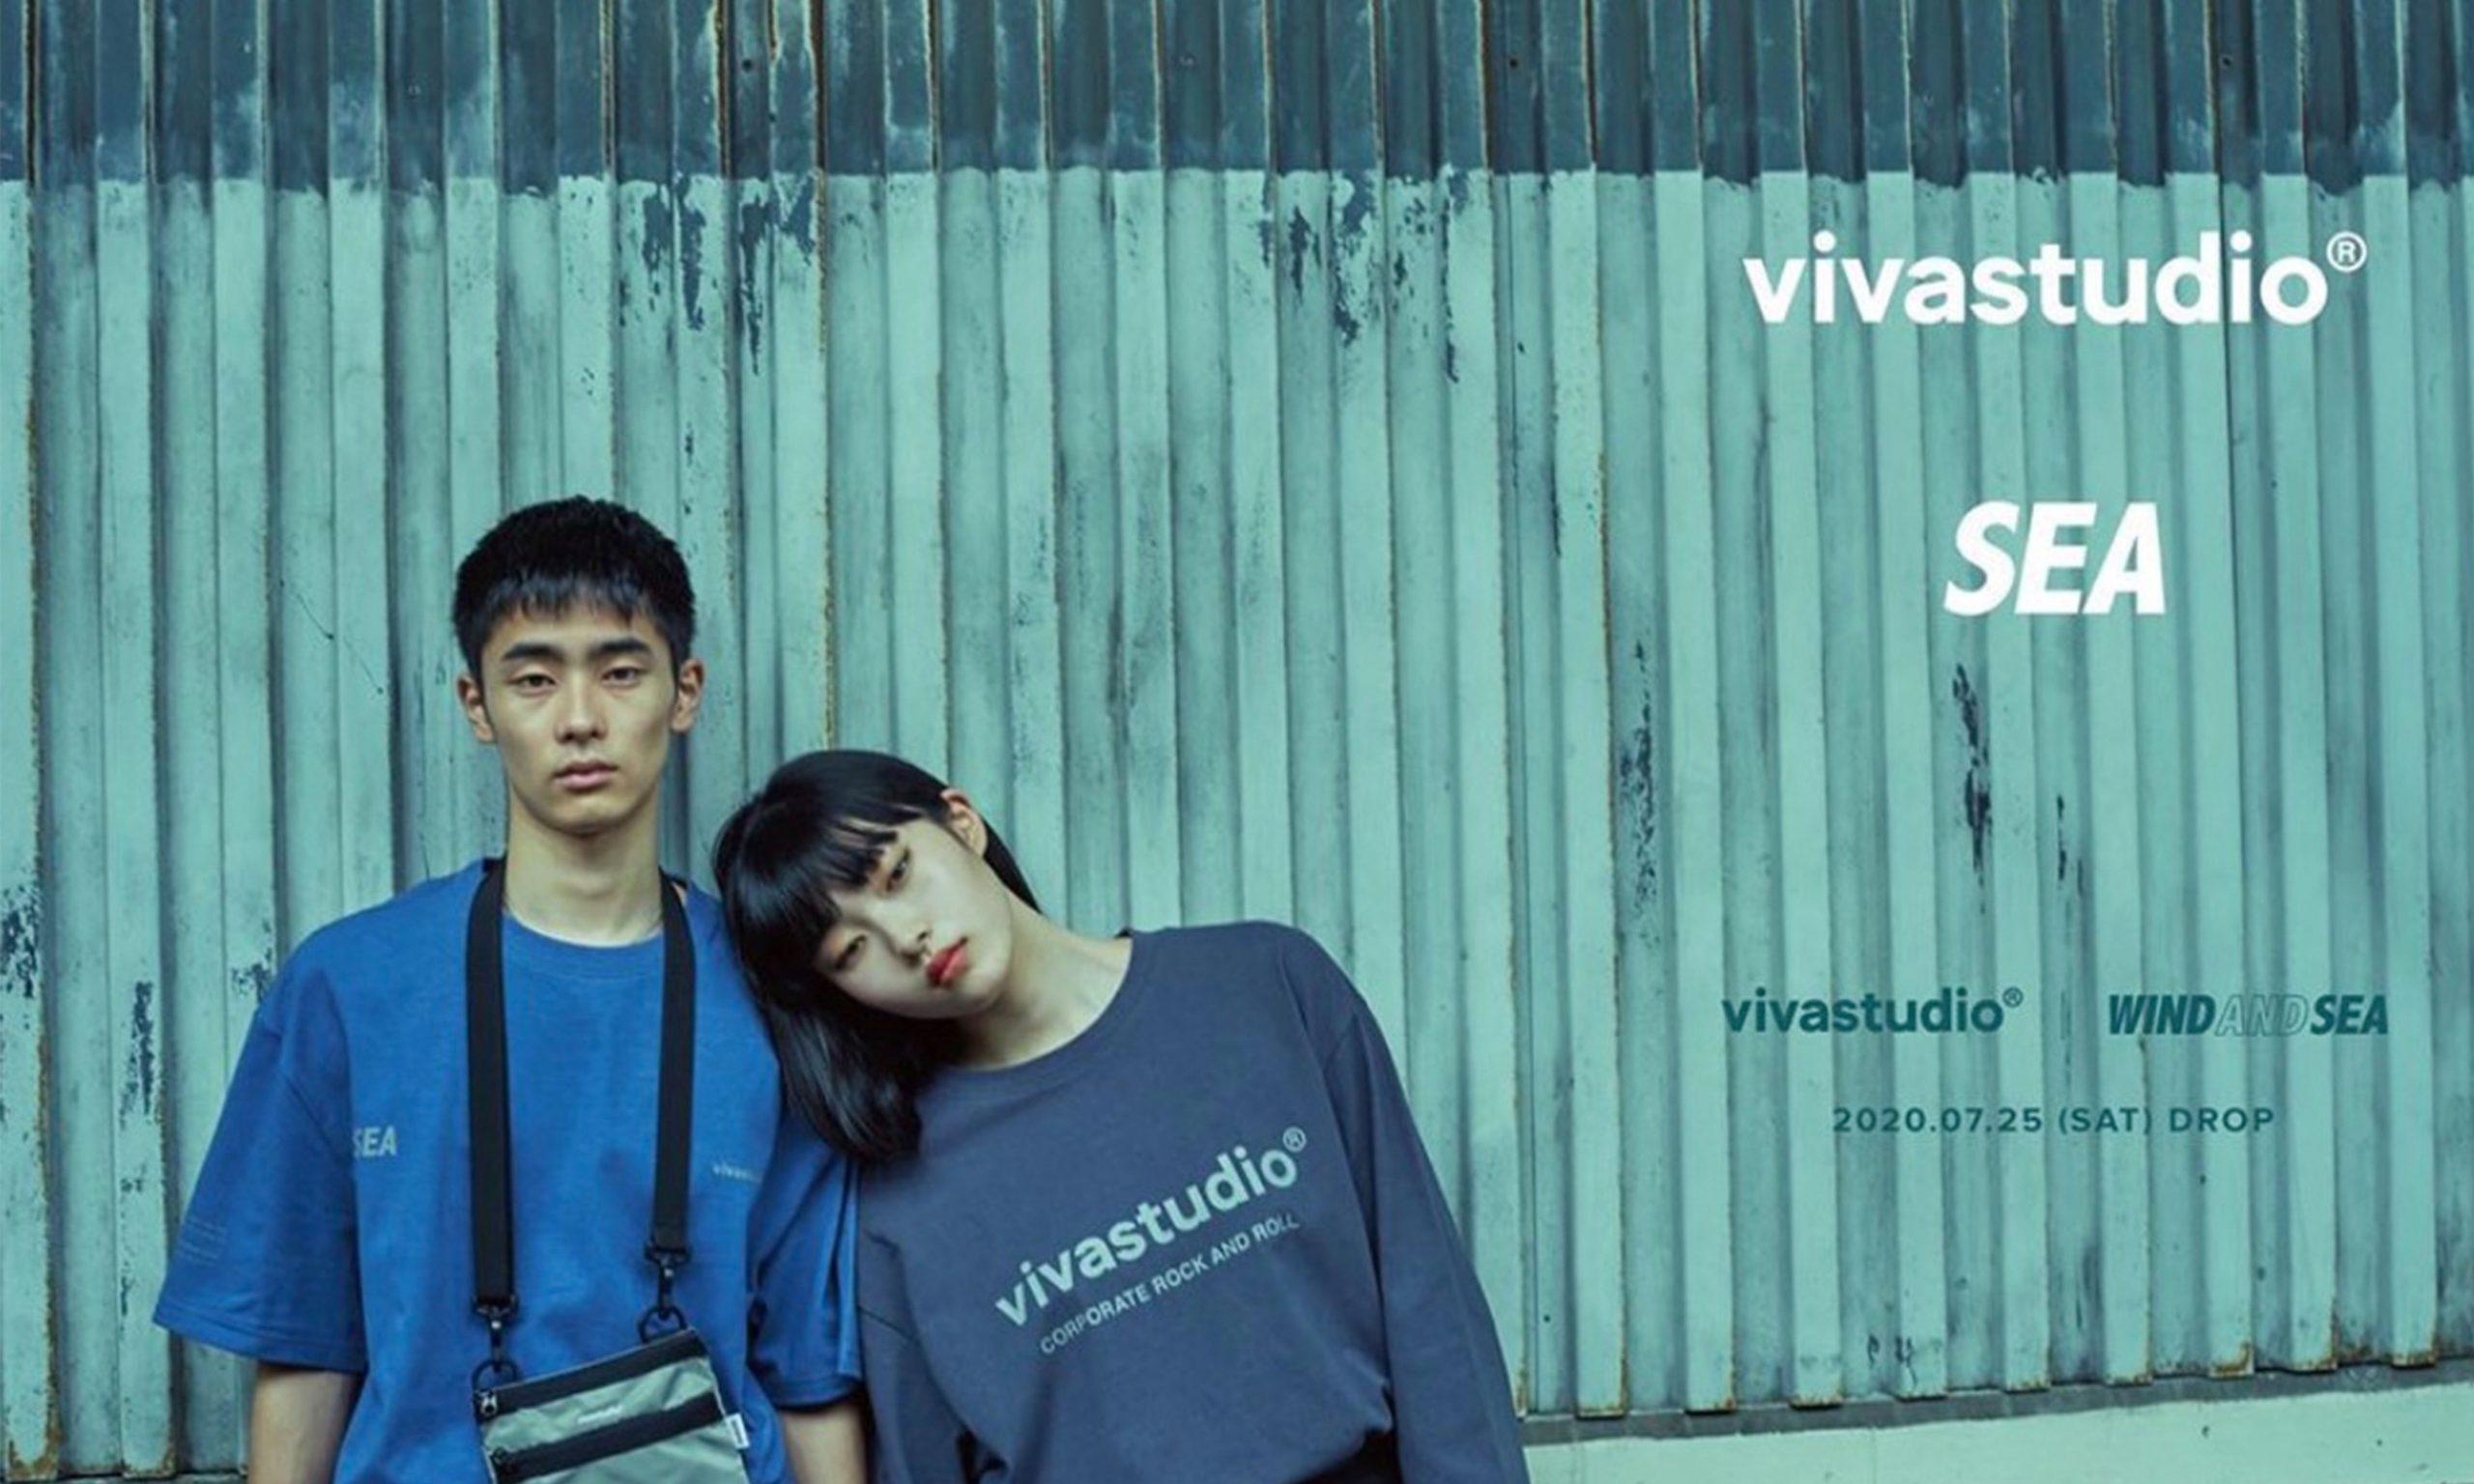 vivastudio × WIND AND SEA 合作系列公开